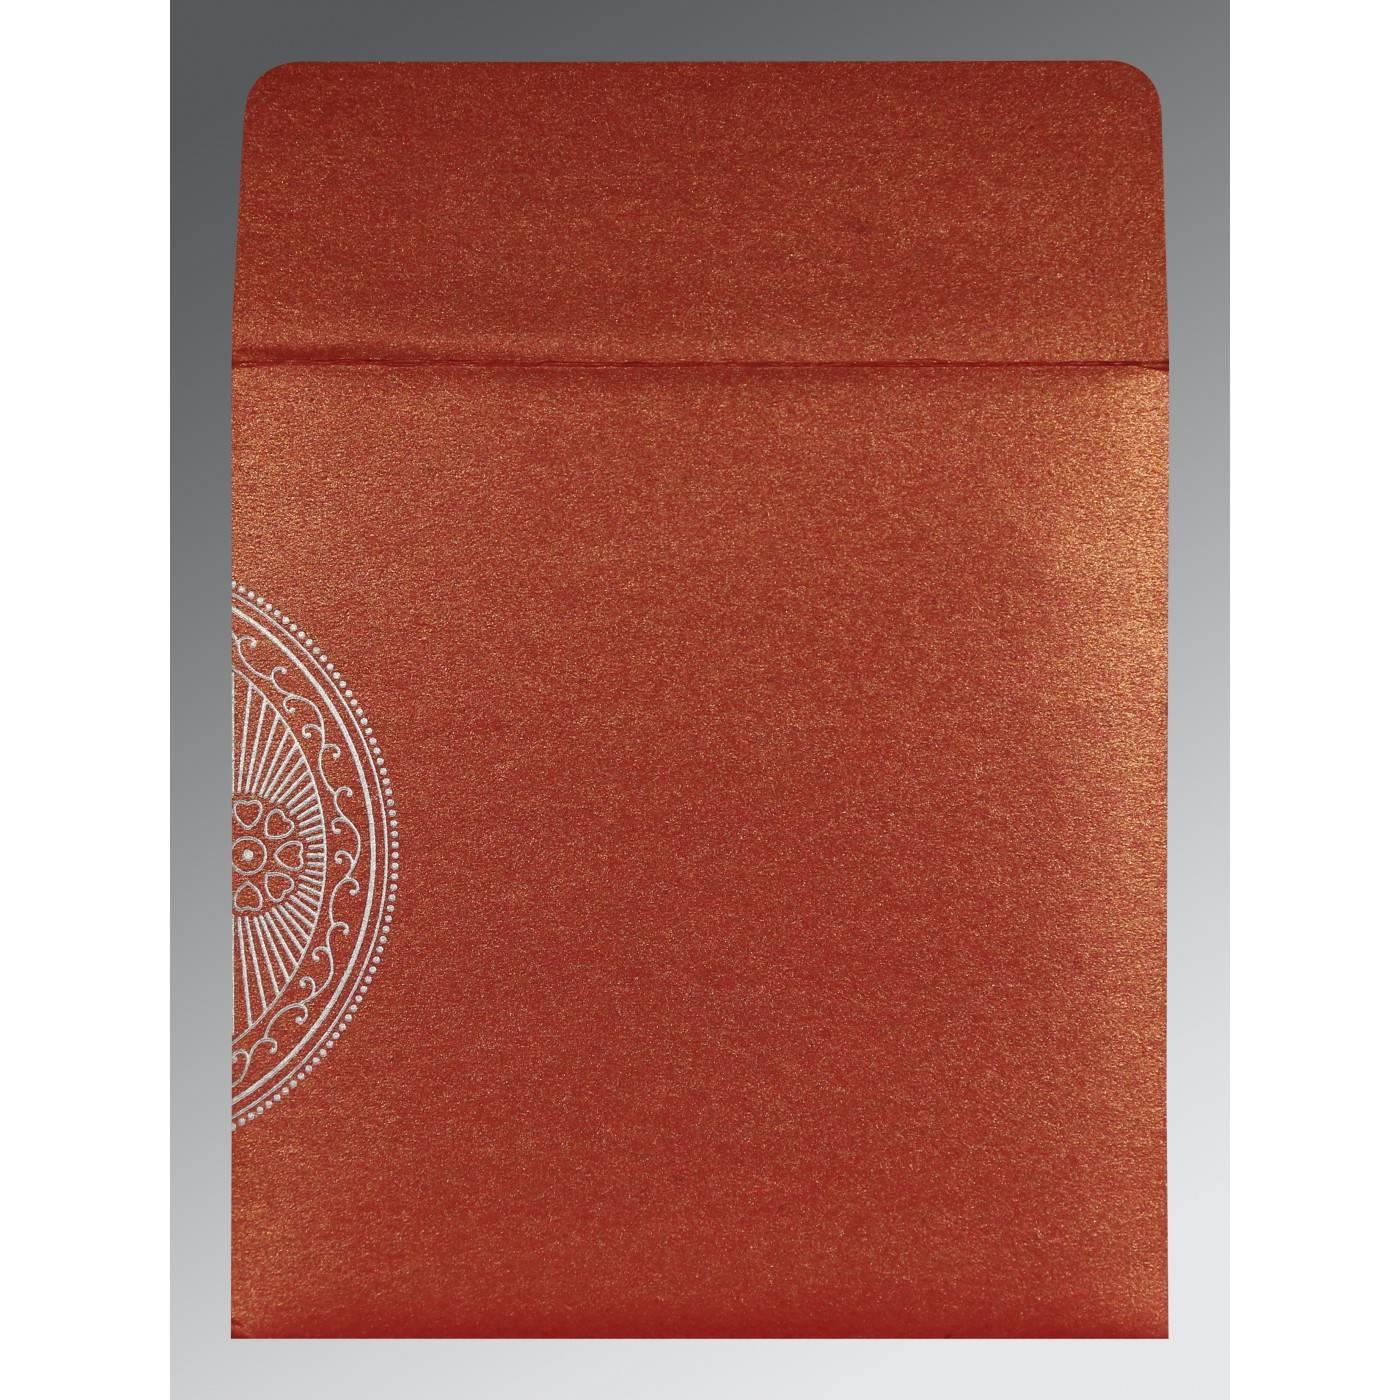 MOJO SHIMMERY PAISLEY THEMED - FOIL STAMPED WEDDING INVITATION : CRU-8230C - IndianWeddingCards